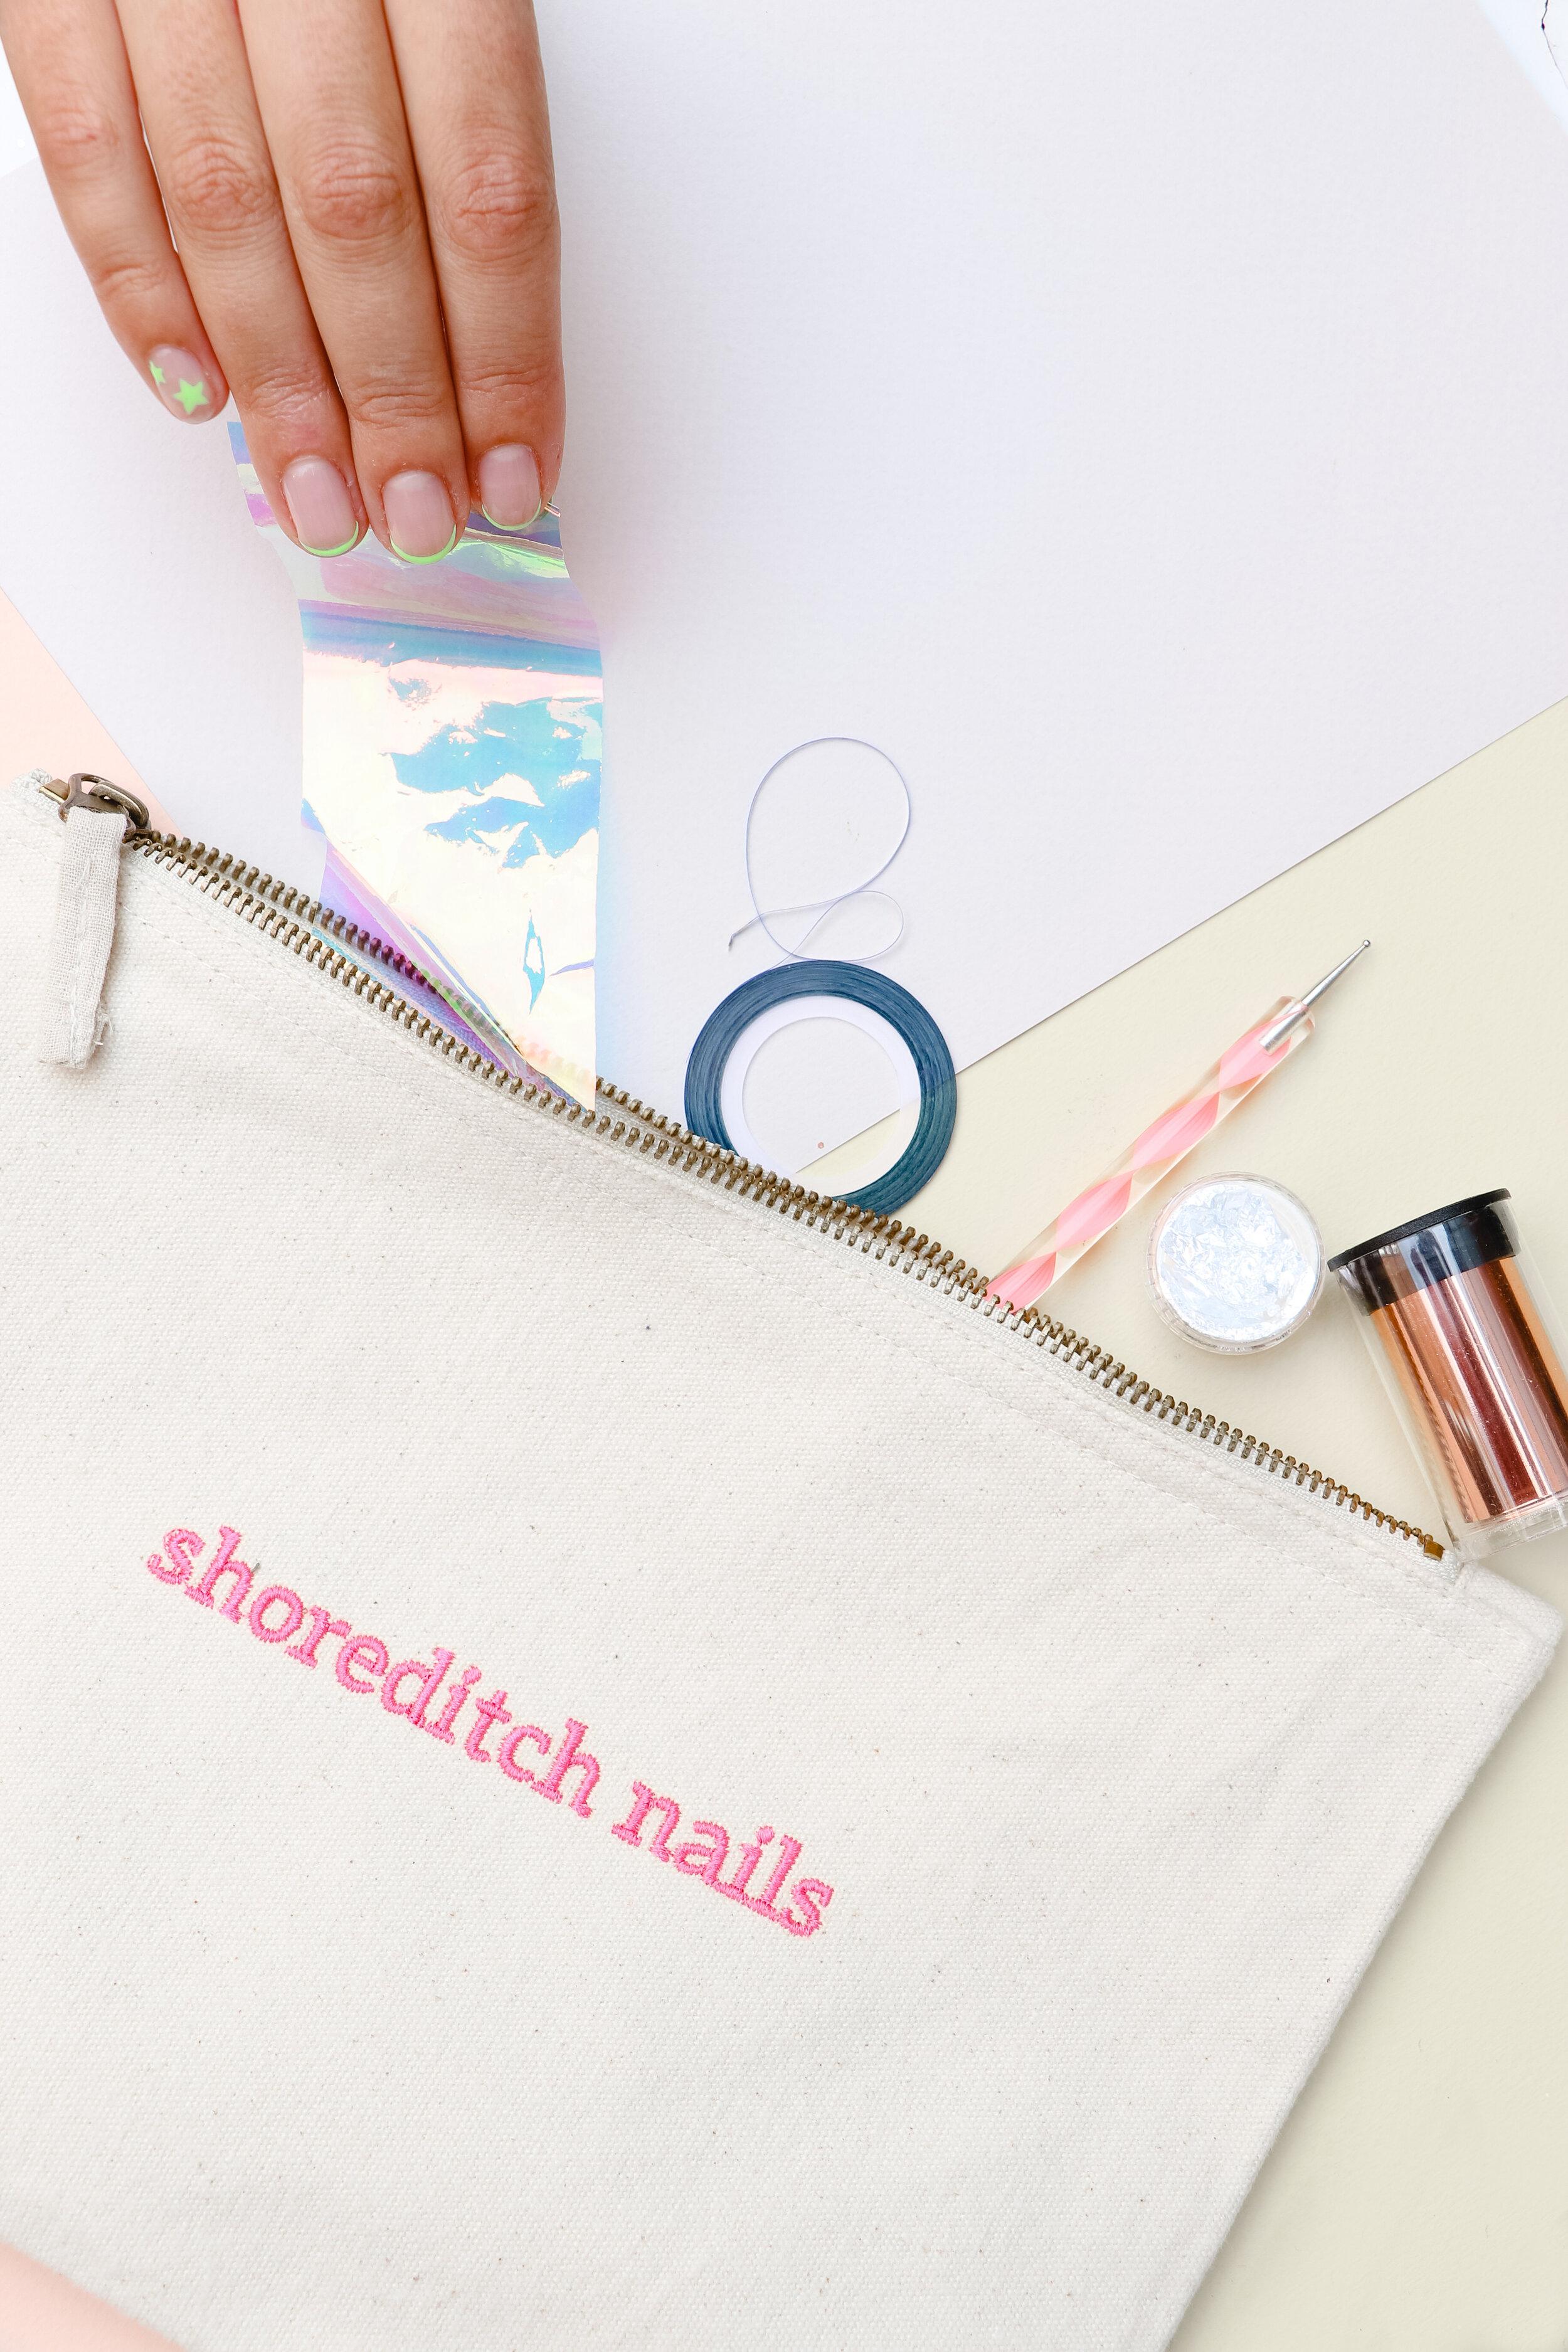 Academy Shoreditch Nails